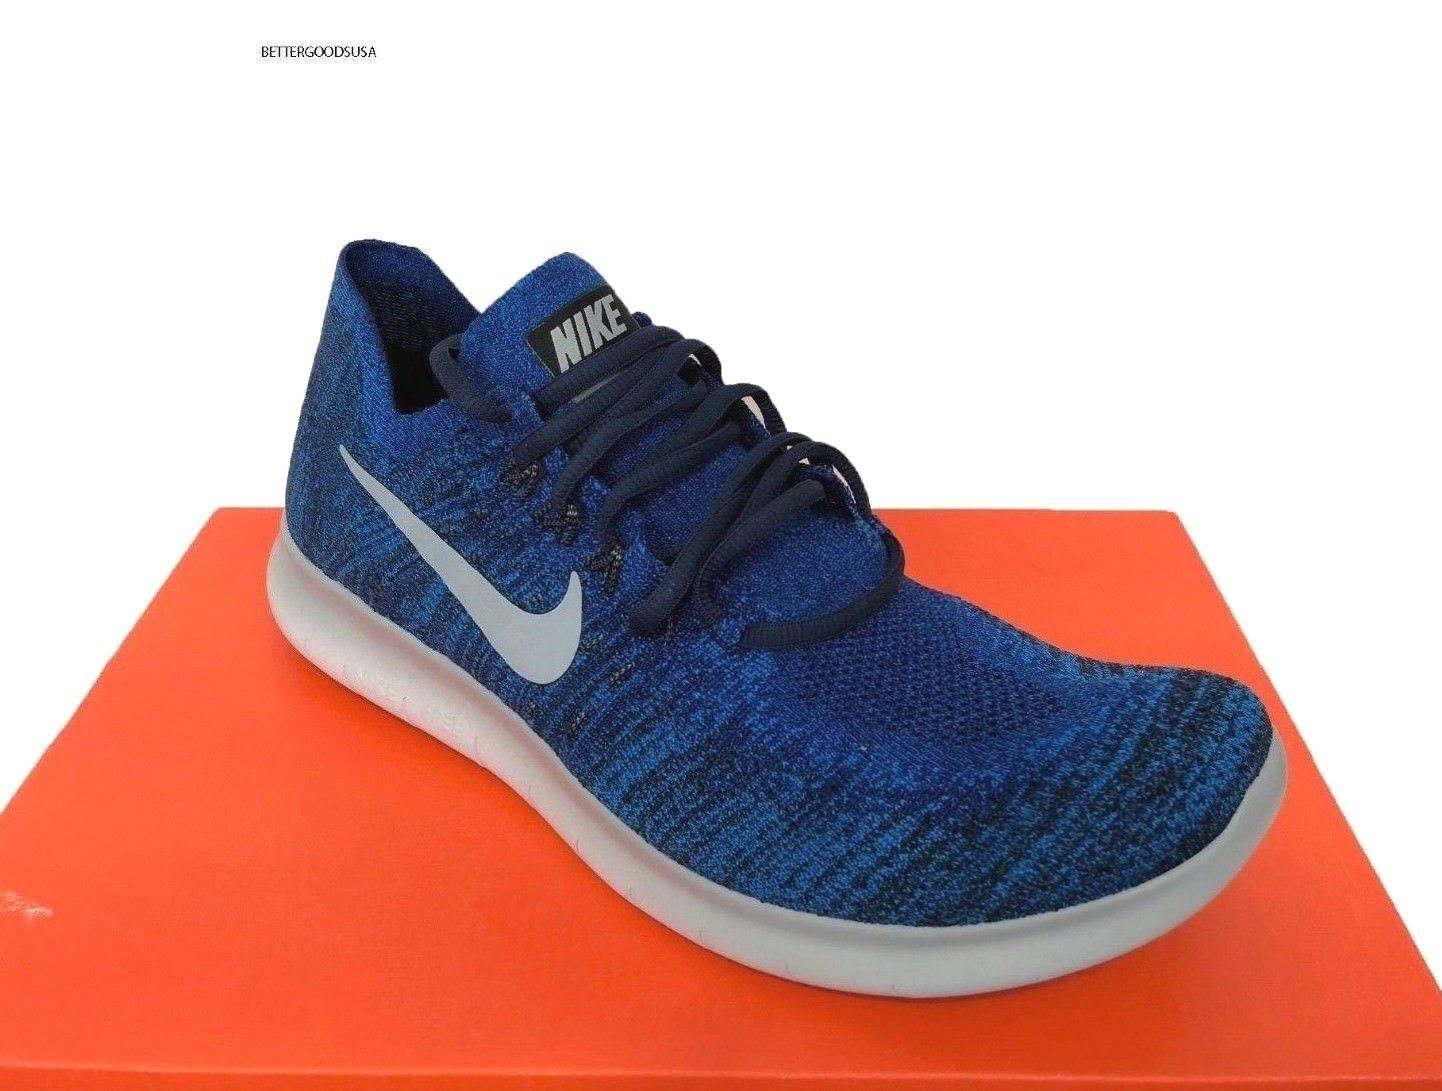 Men 2017 Zapatillas Free Tamaño Nike Flyknit 10 Grey Rn De 5 880843 Royal Running 405 Blue F101Uqt